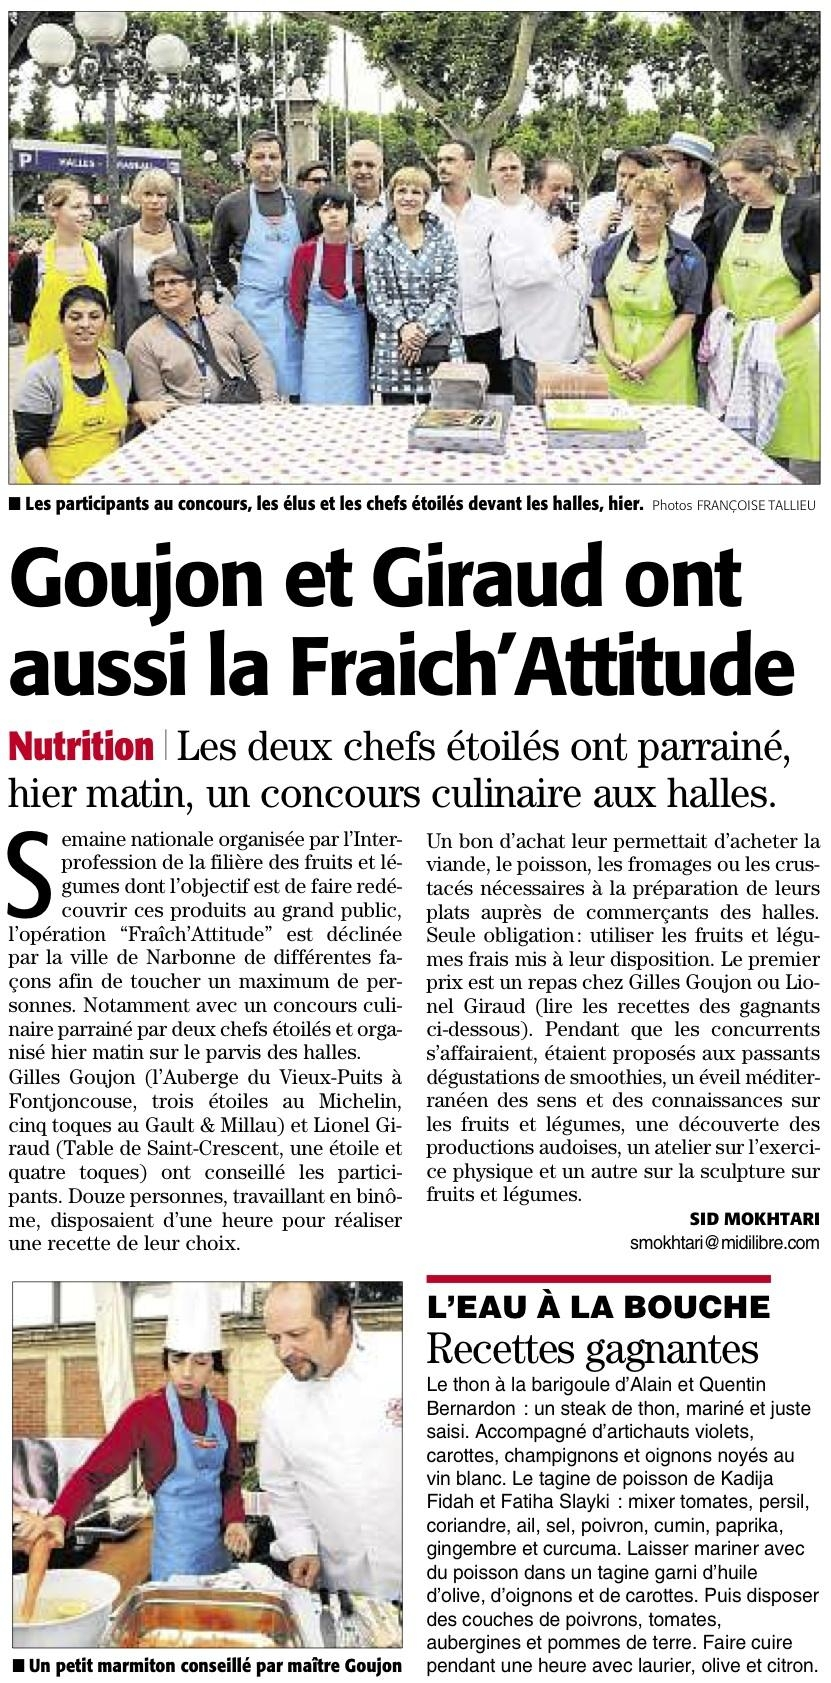 fraich-attitude-halles-Midi-Libre-05-06-2011